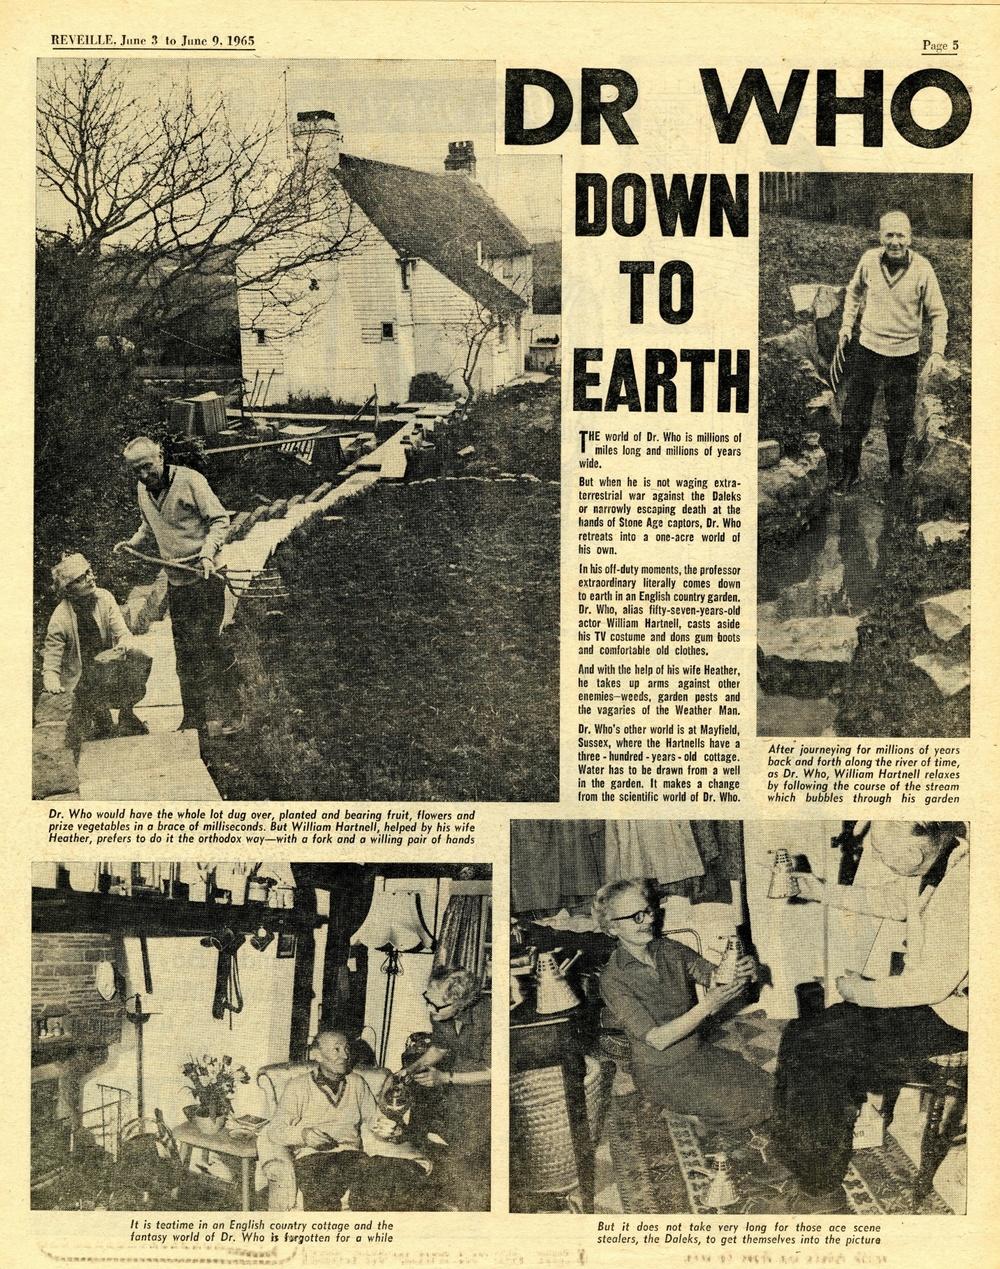 Reveille, June 3-9, 1965